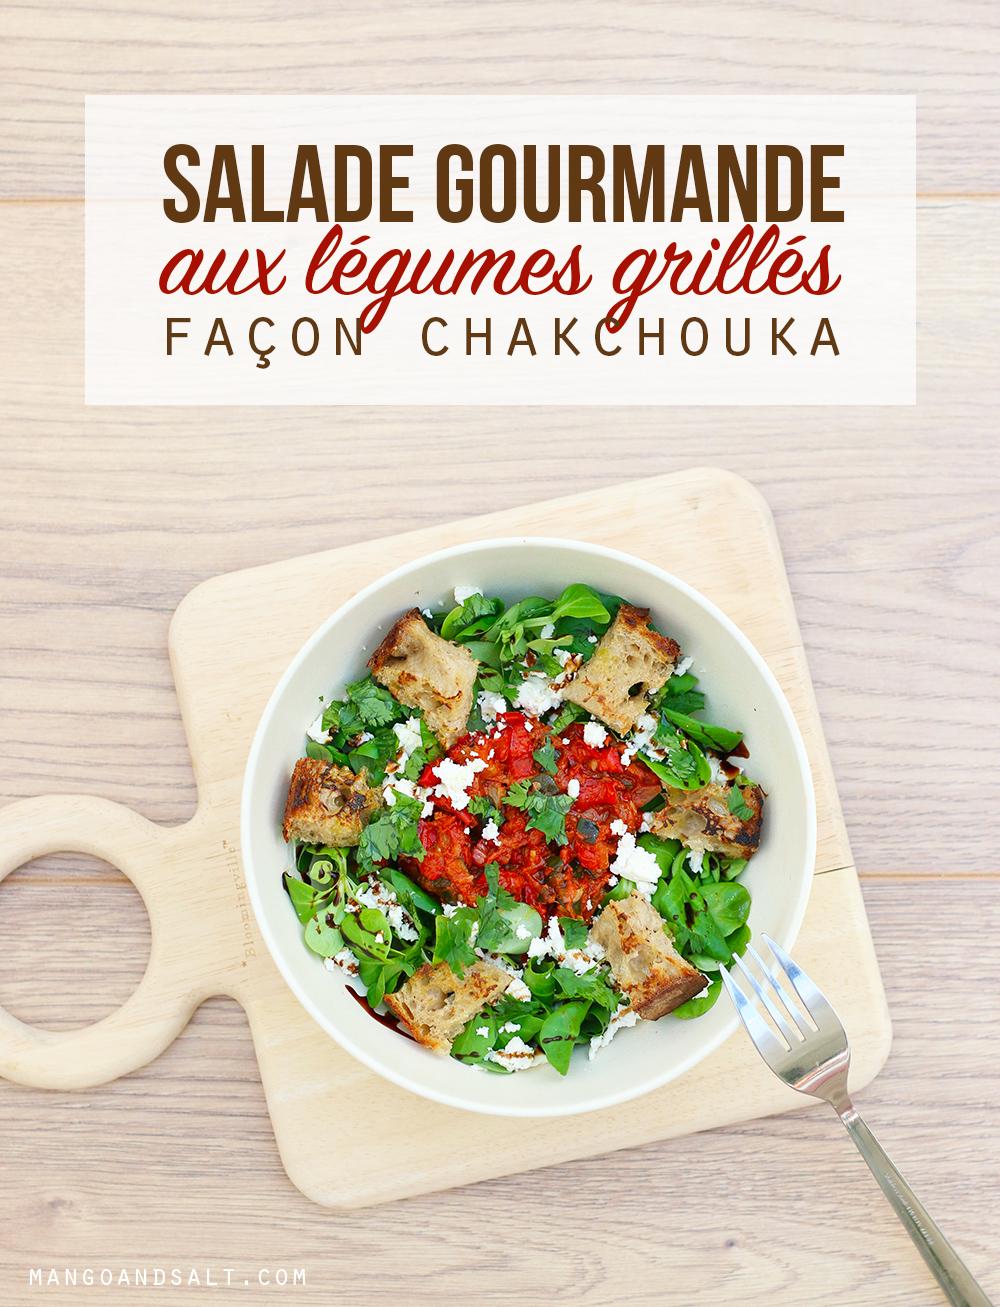 Salade gourmande de légumes grillés façon chakchouka - Mango & Salt